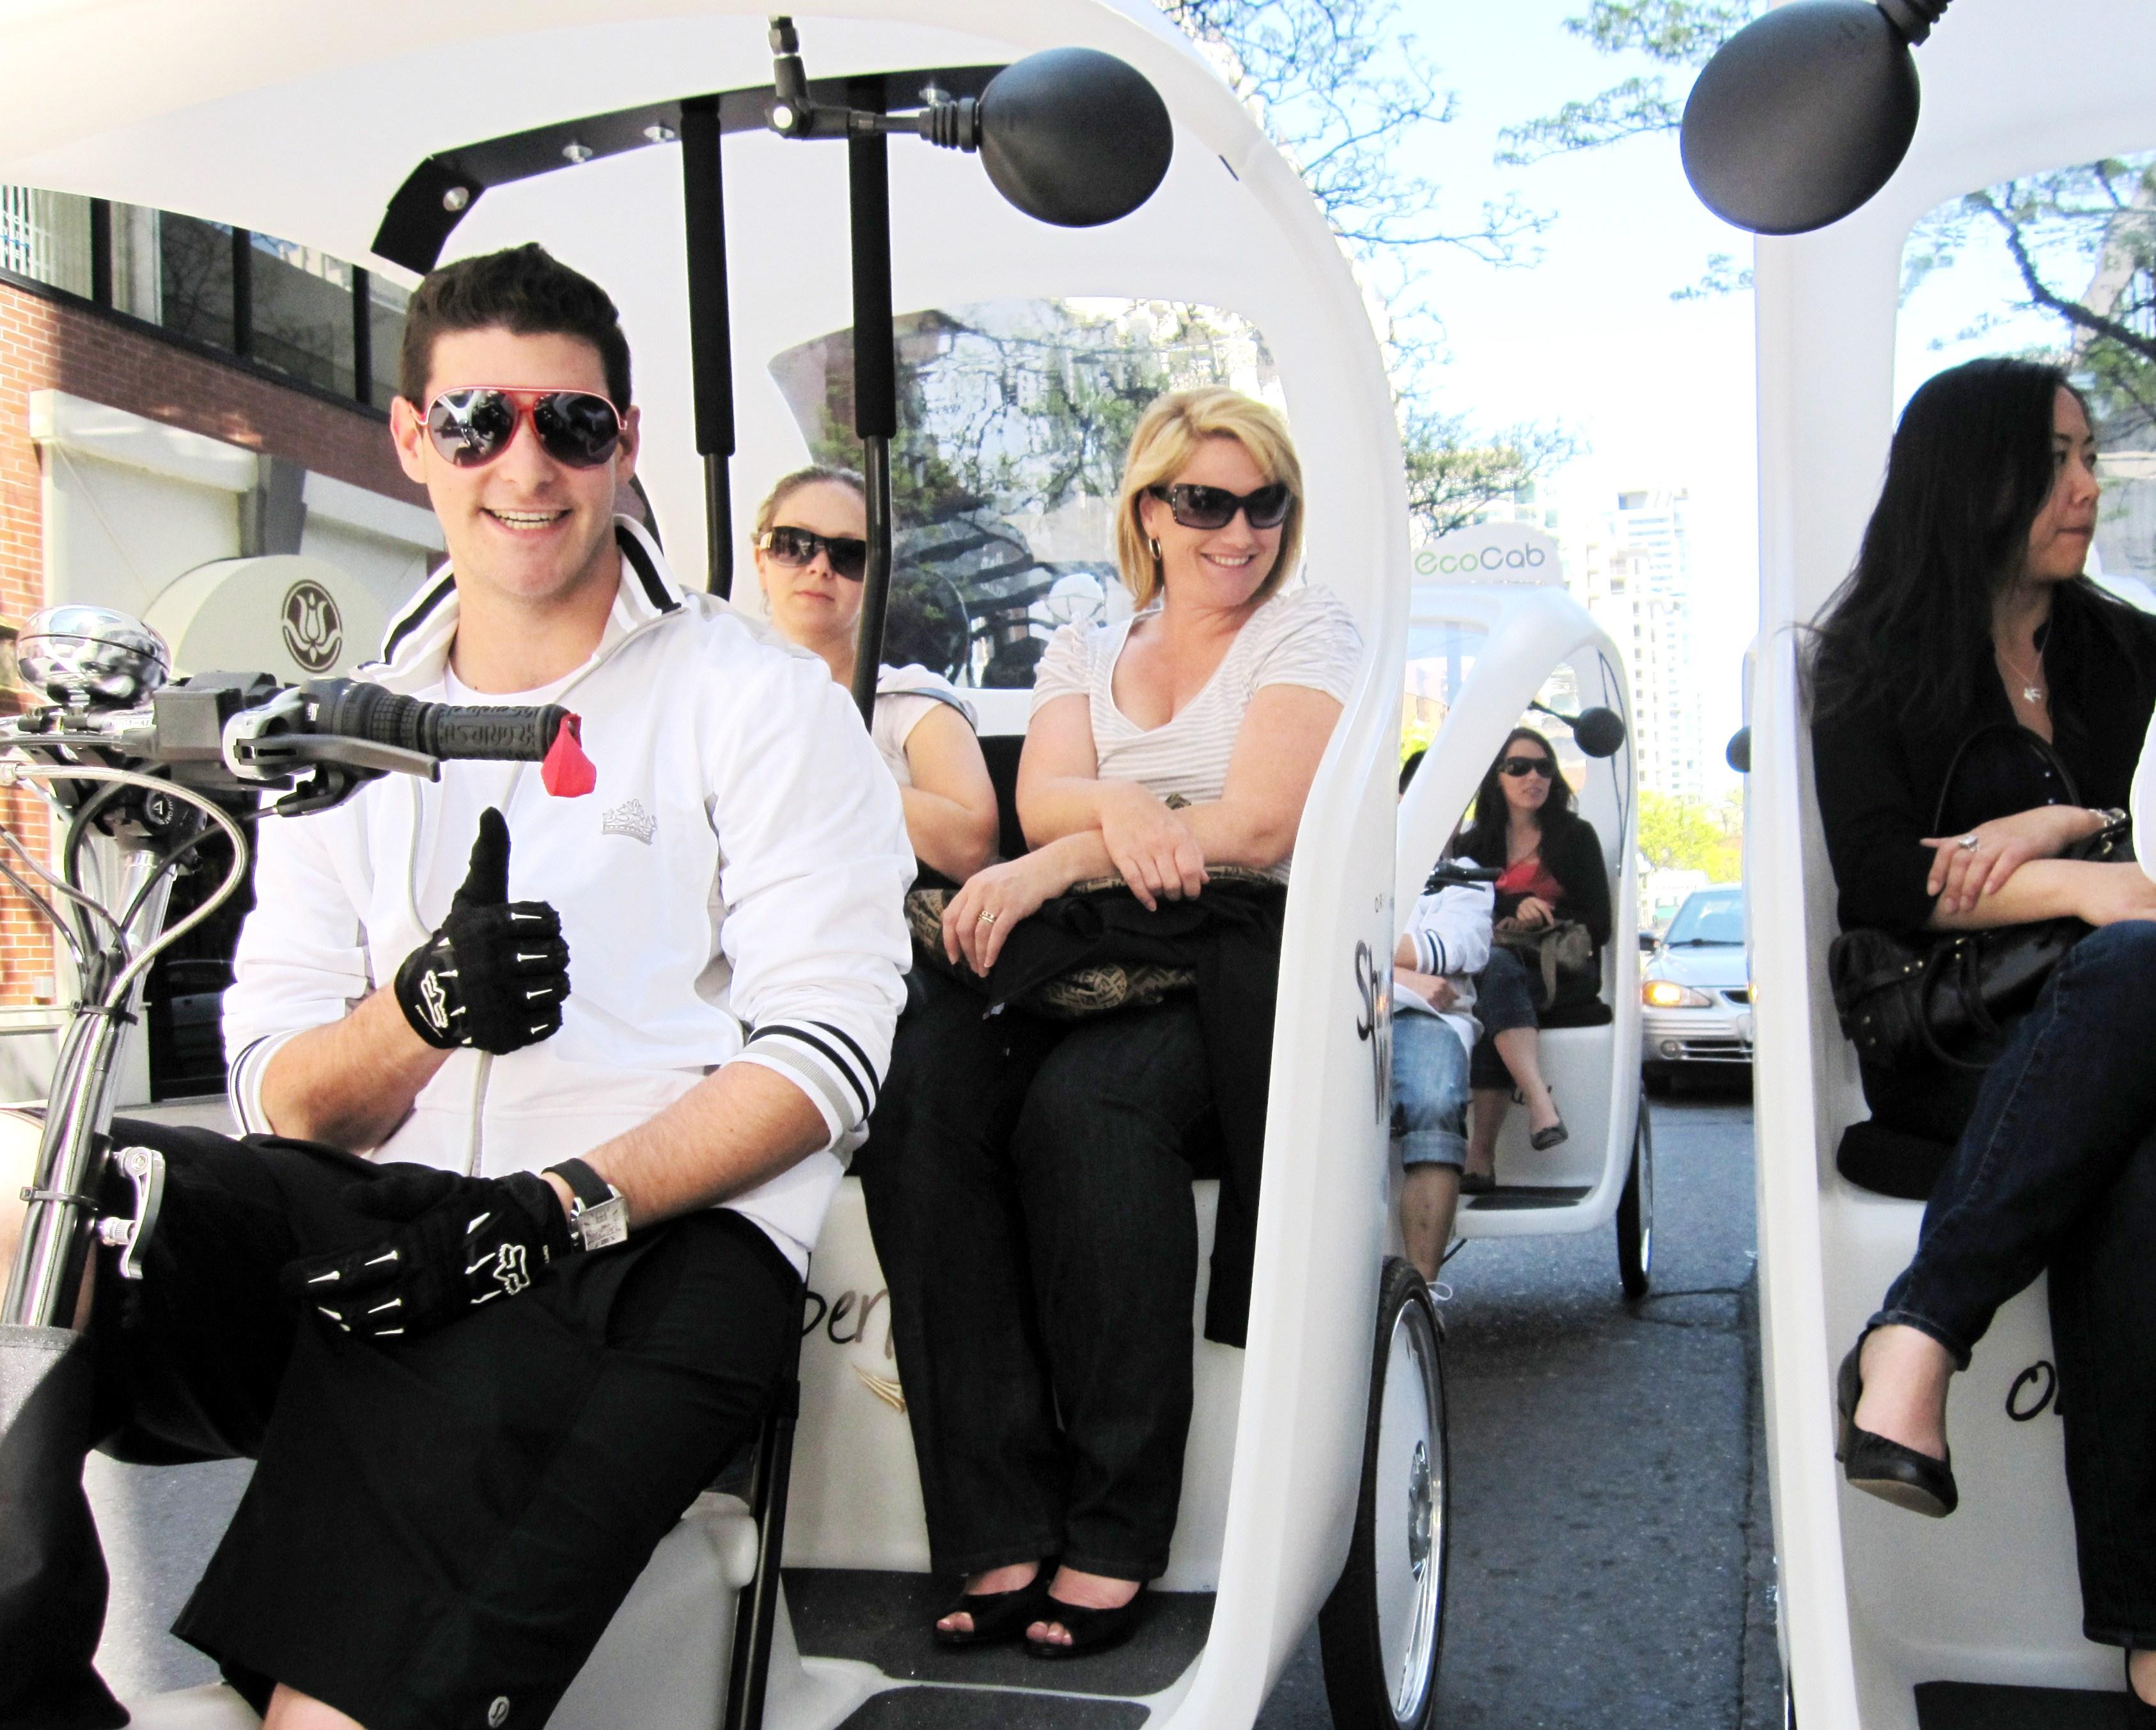 electric pedicab feet passengers